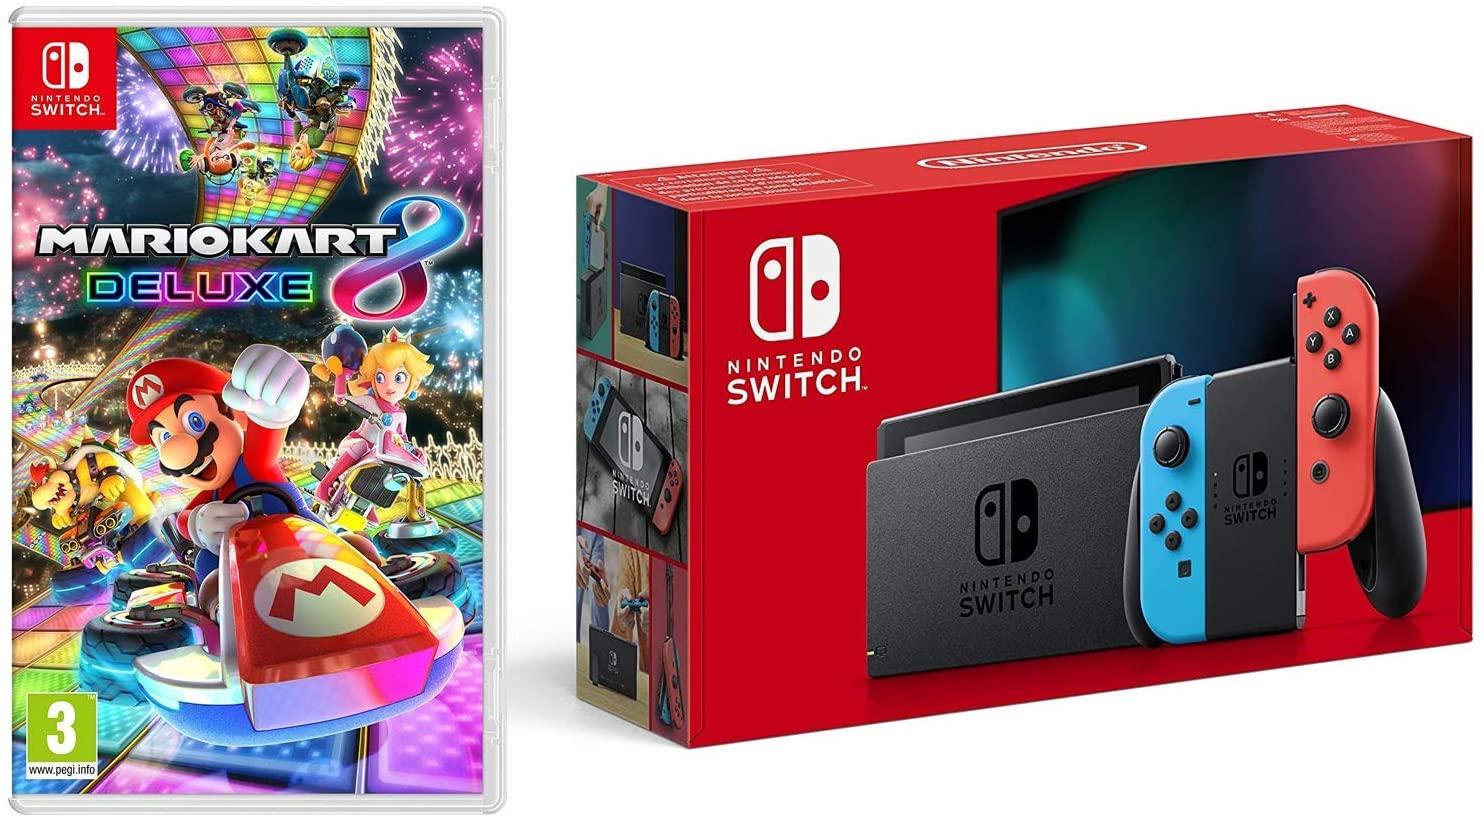 Nintendo Switch Neon with Mario Kart 8 Deluxe £289 Amazon Prime Exclusive @ Amazon